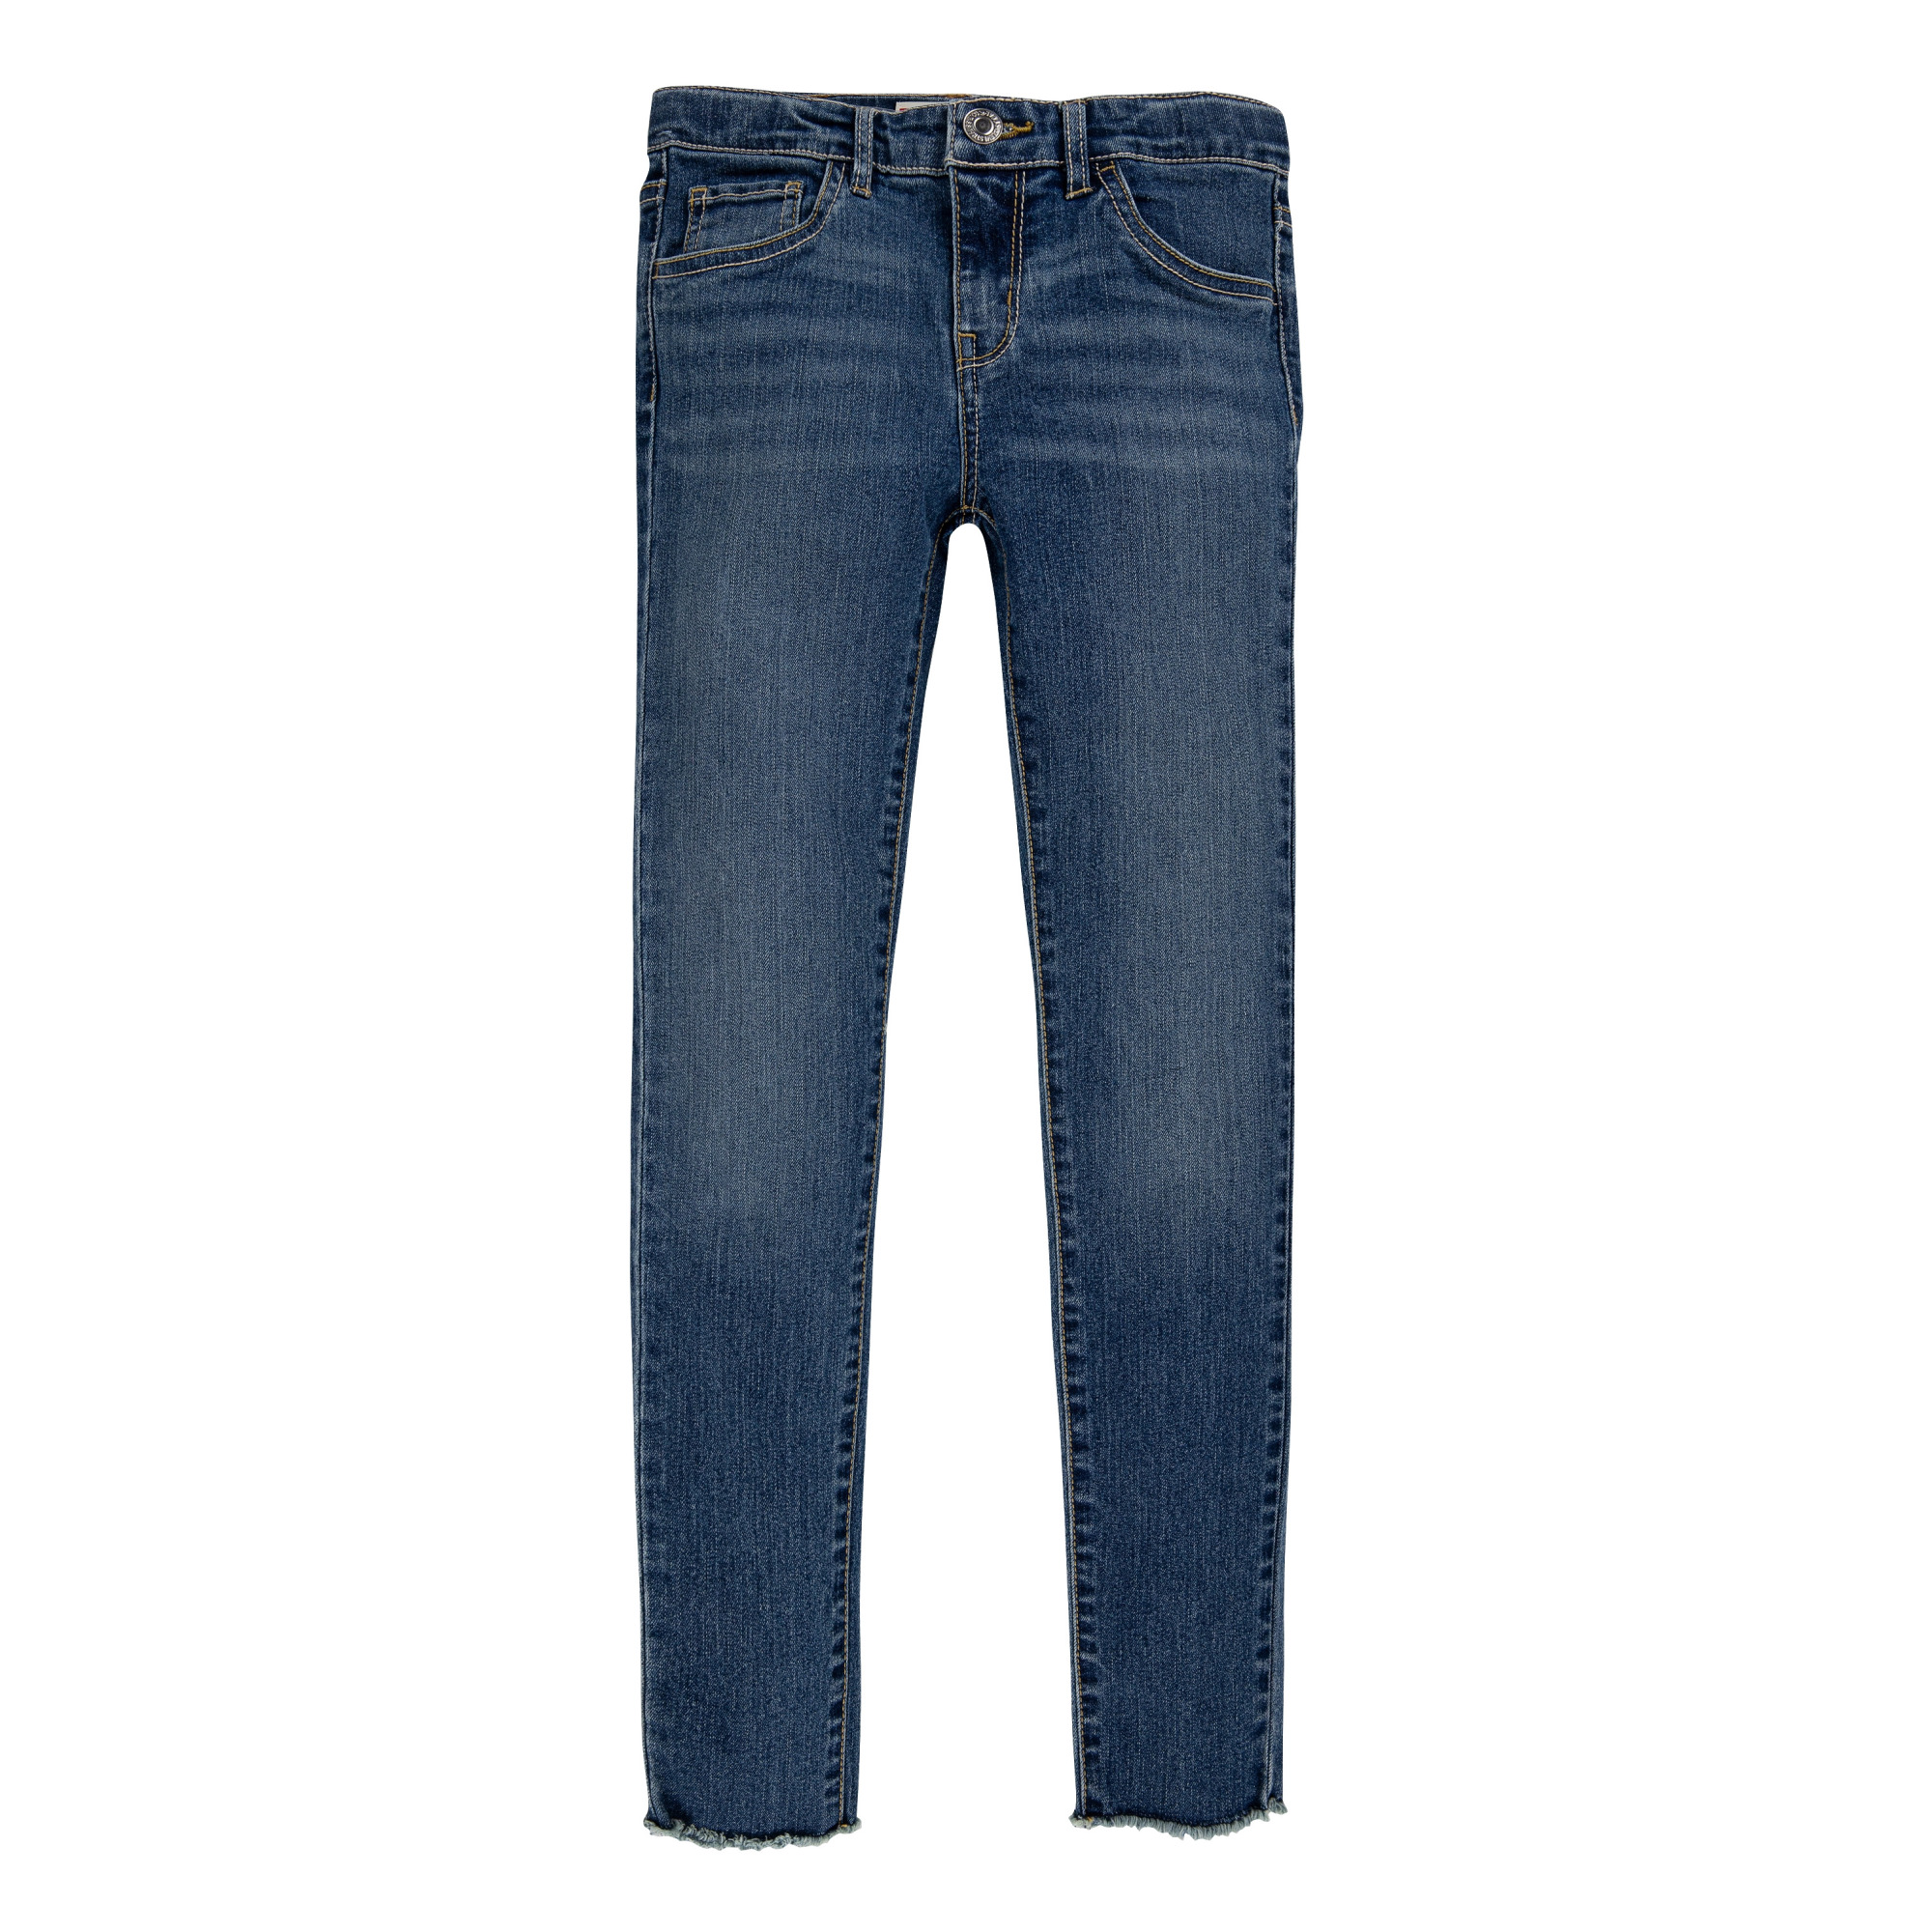 Jean Super Skinny 710